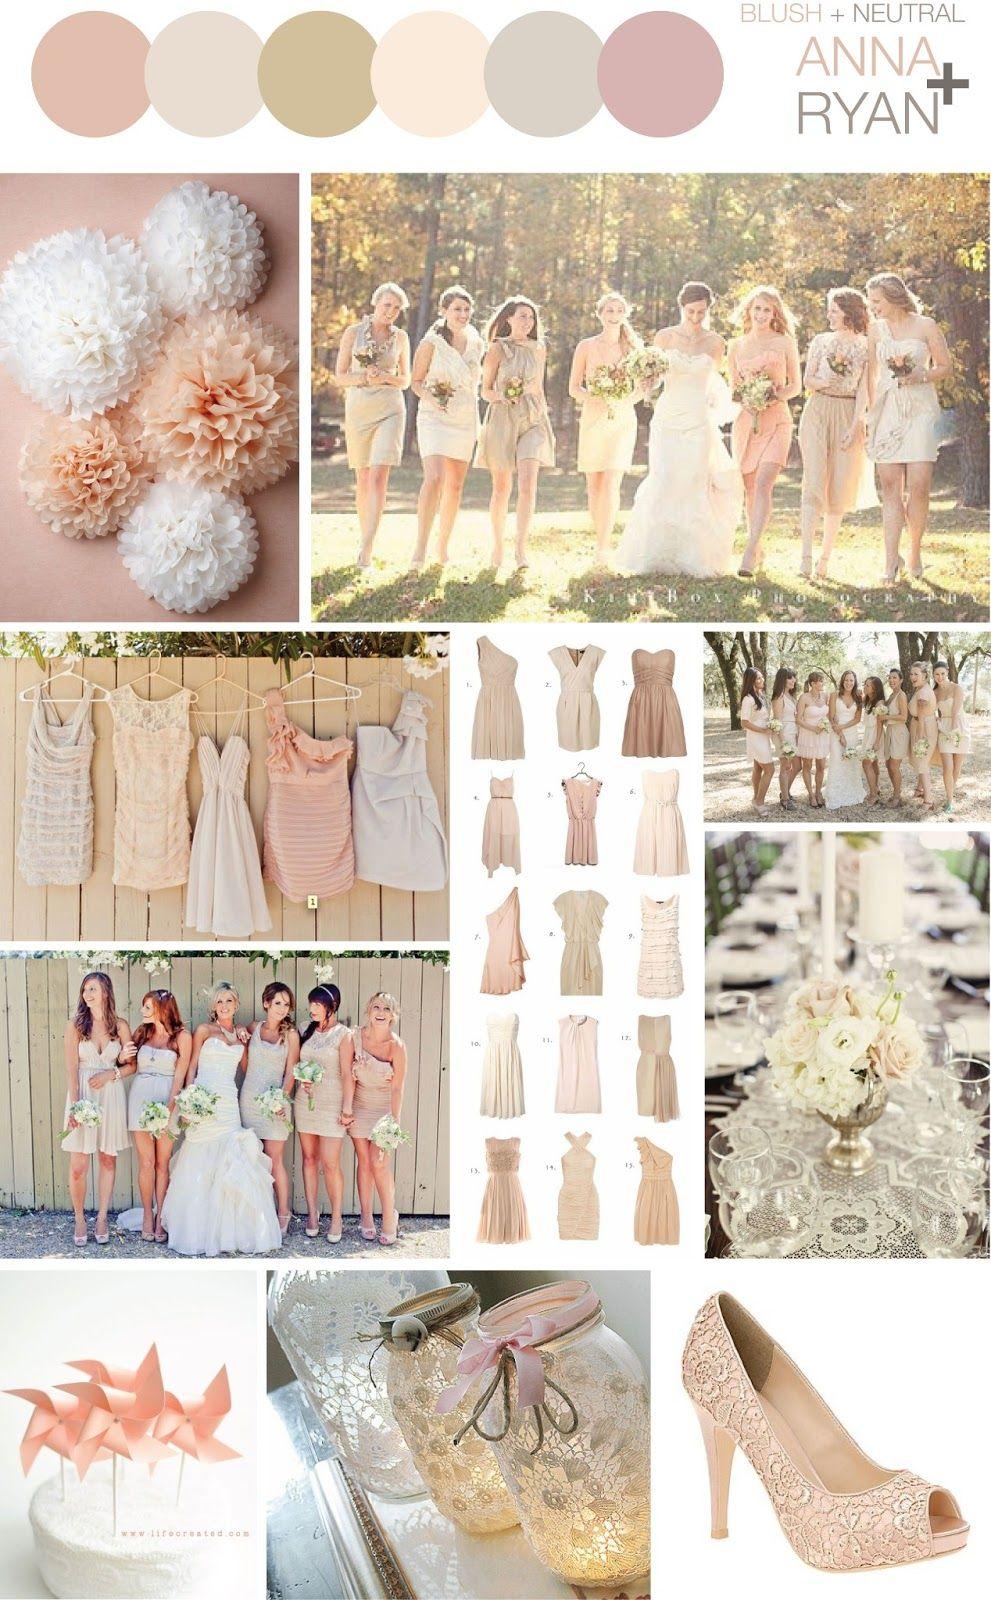 Blush + Neutral Color Scheme - Wedding | Wedding Ideas | Pinterest ...